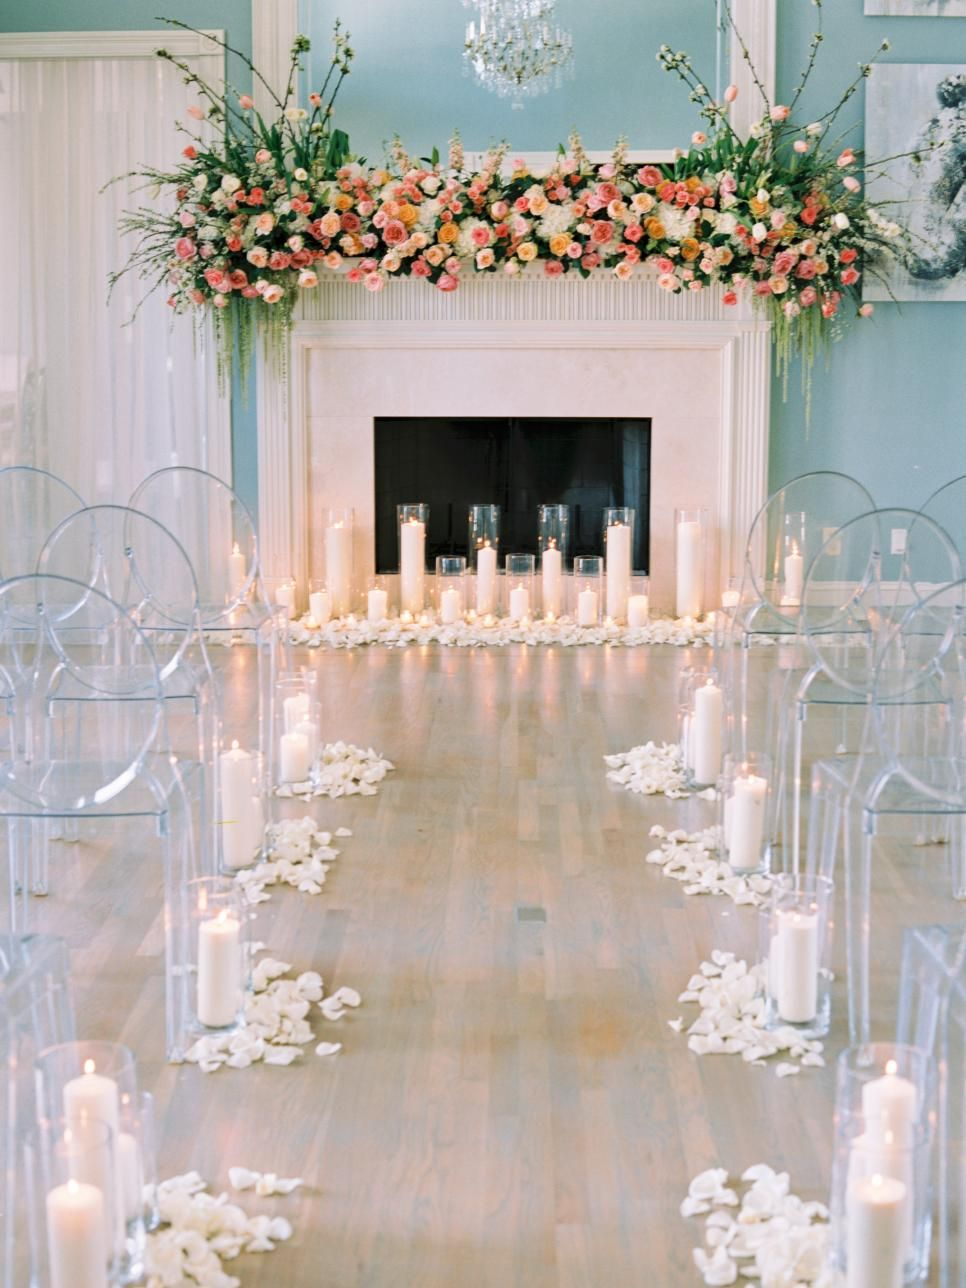 Wedding aisle decor ideas diy   DIY Wedding Arbors Altars u Aisles  Wedding Ideas  Pinterest